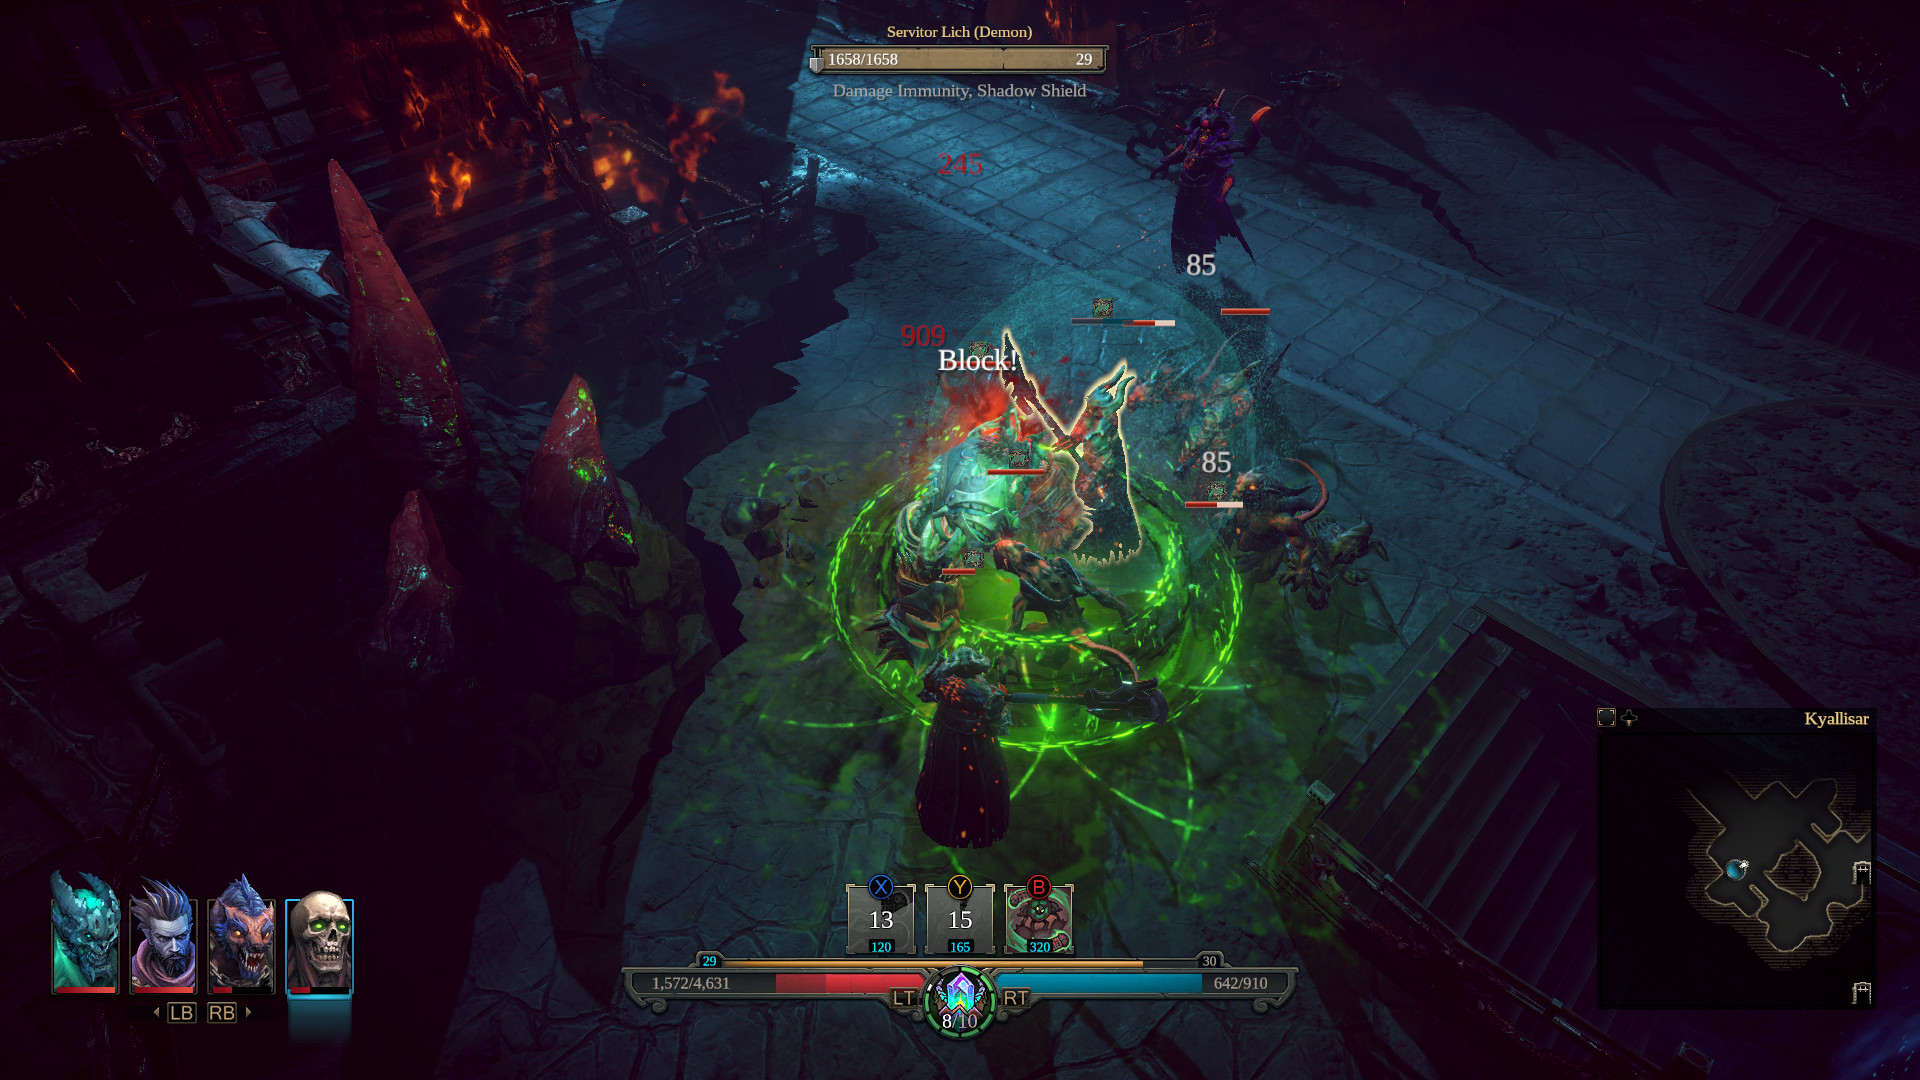 Save 70% on Shadows: Awakening on Steam